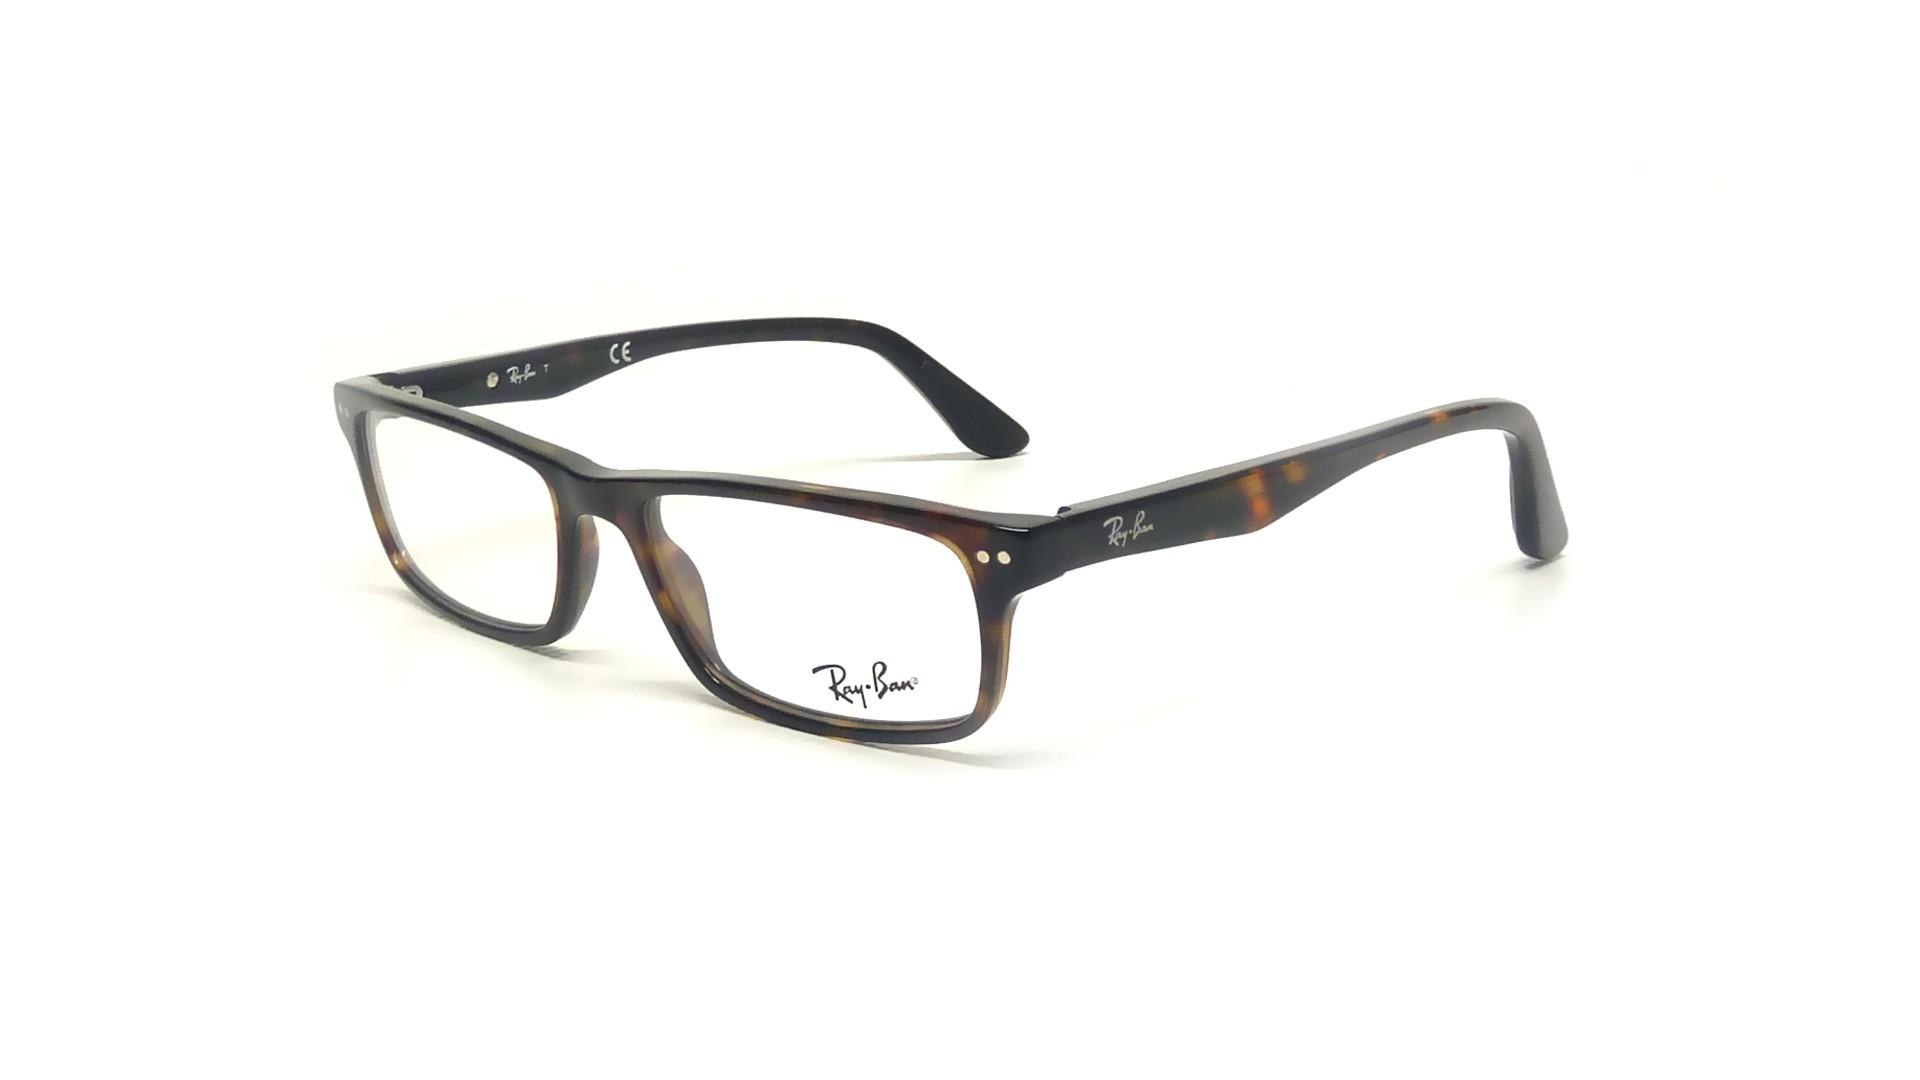 discount ray ban eyeglasses dswq  ray ban eyeglasses rx5277